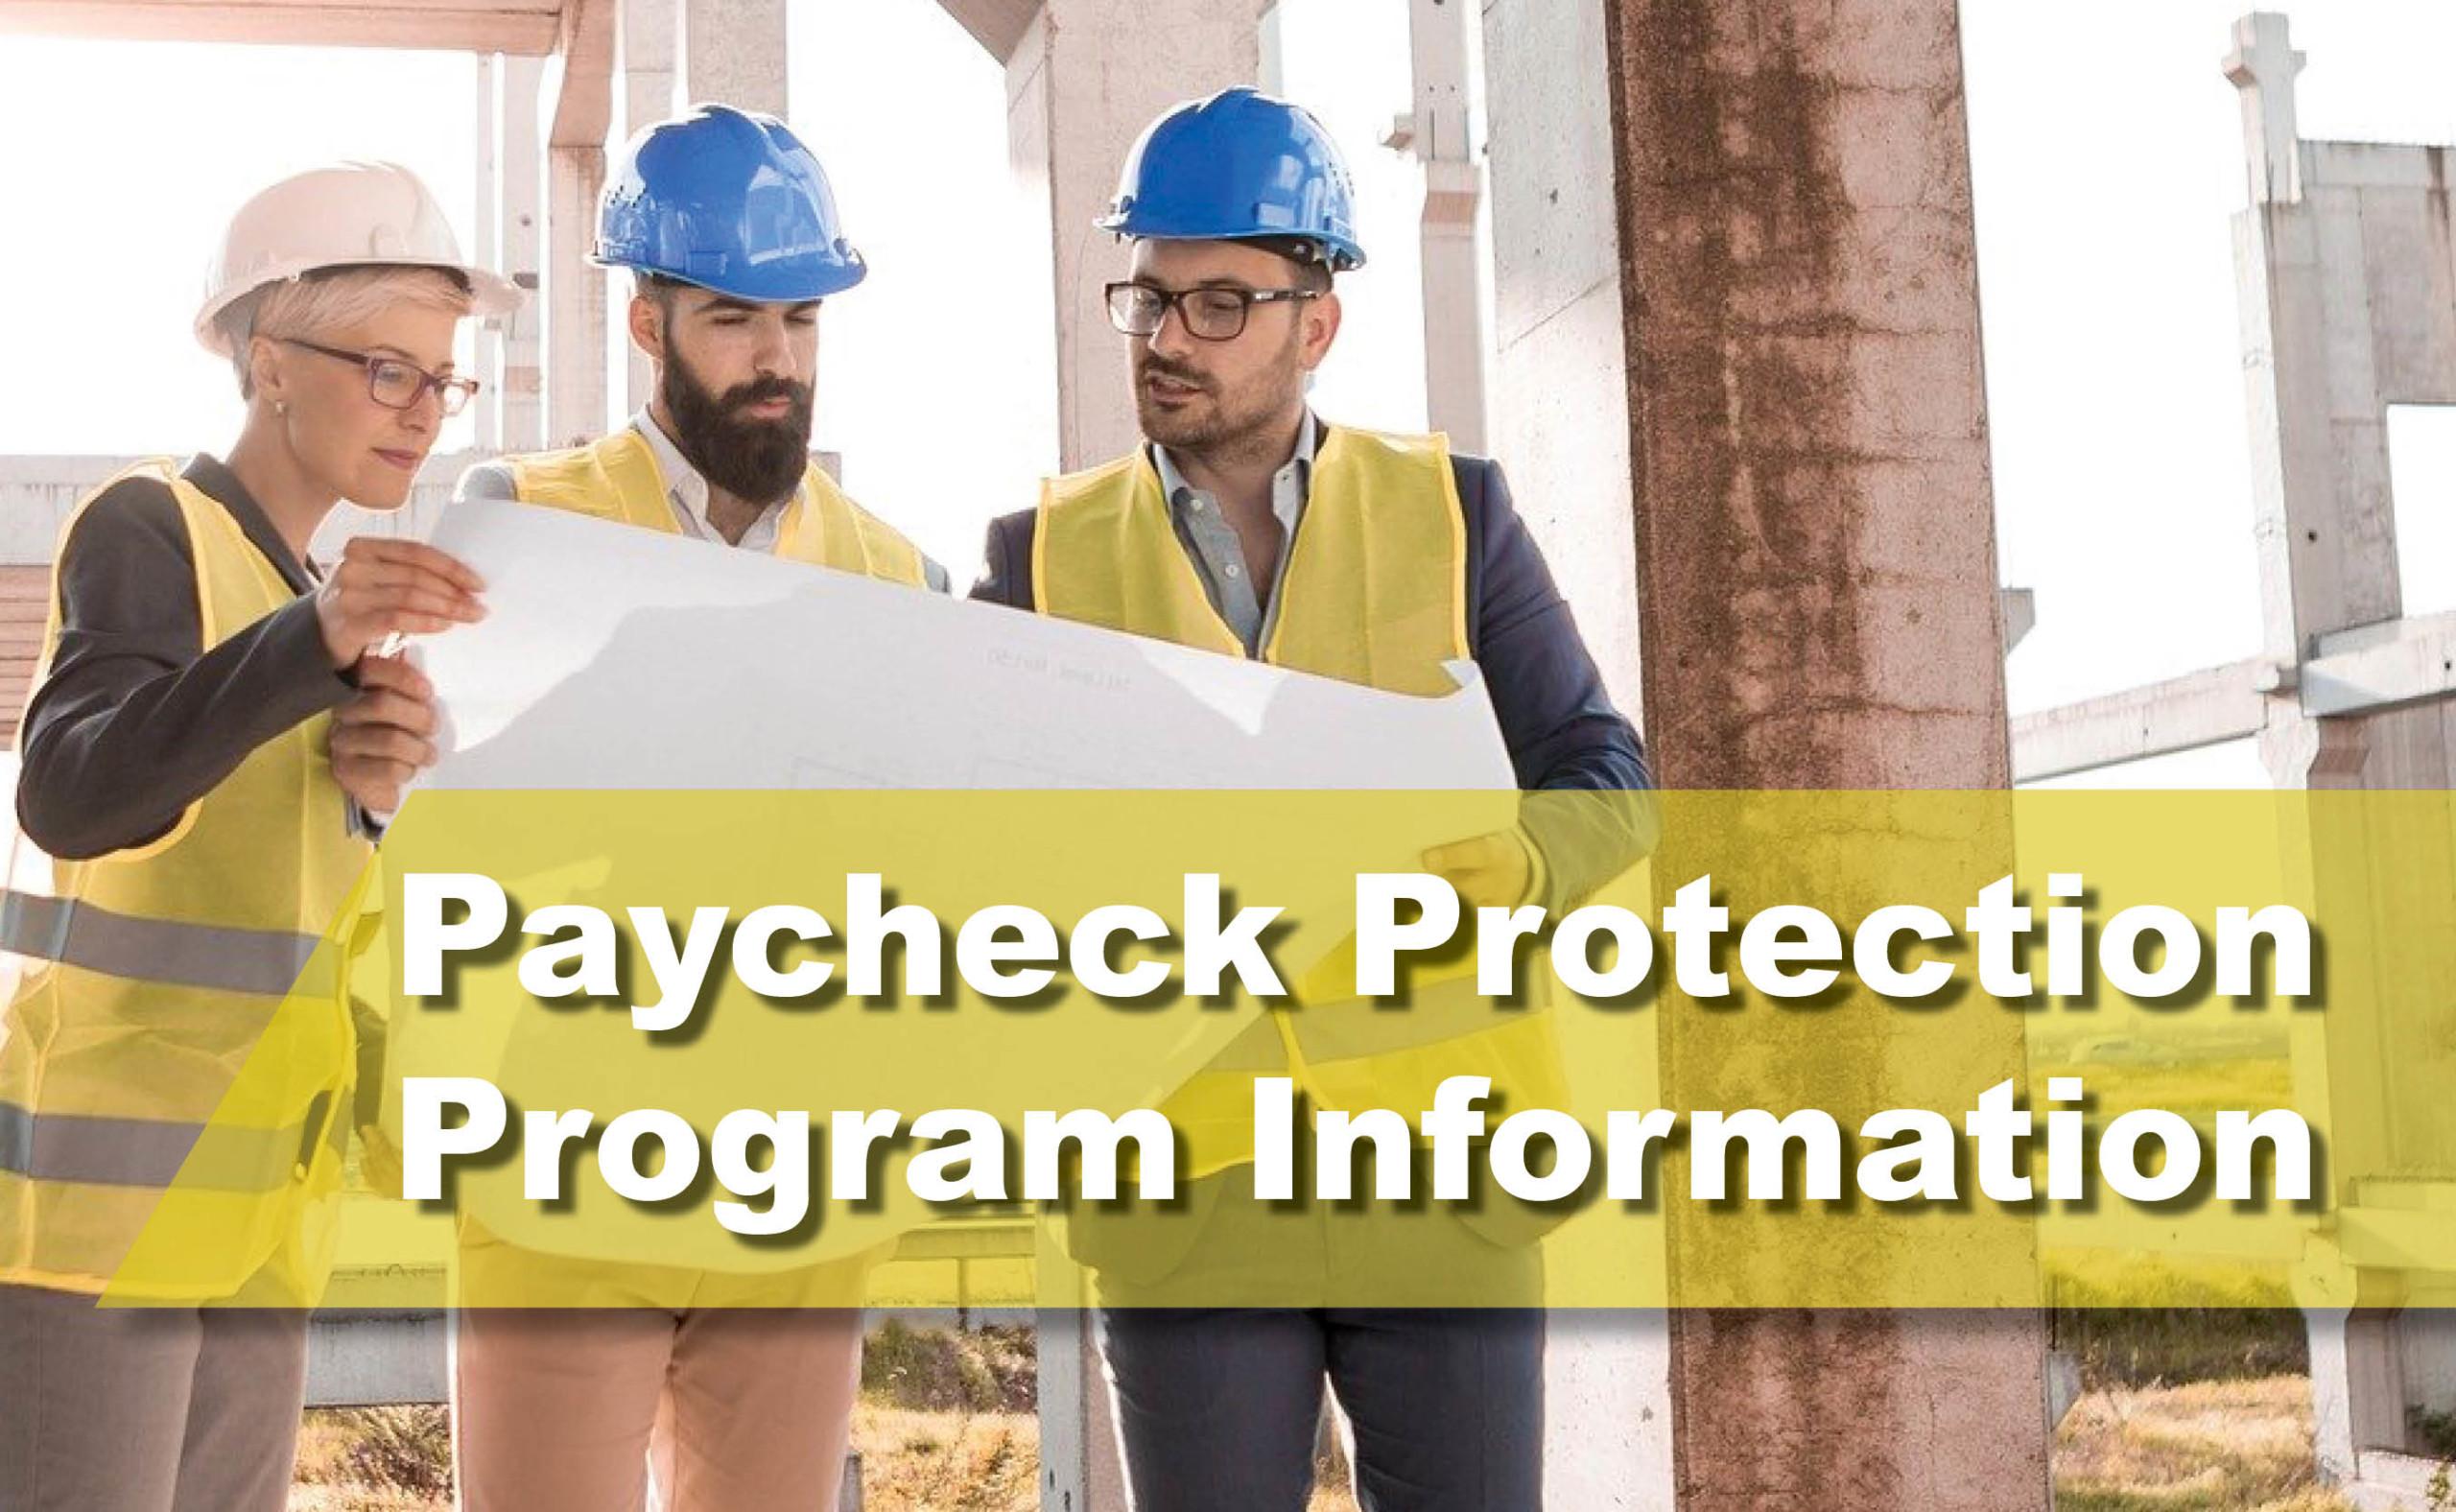 Paycheck Protection Program Information